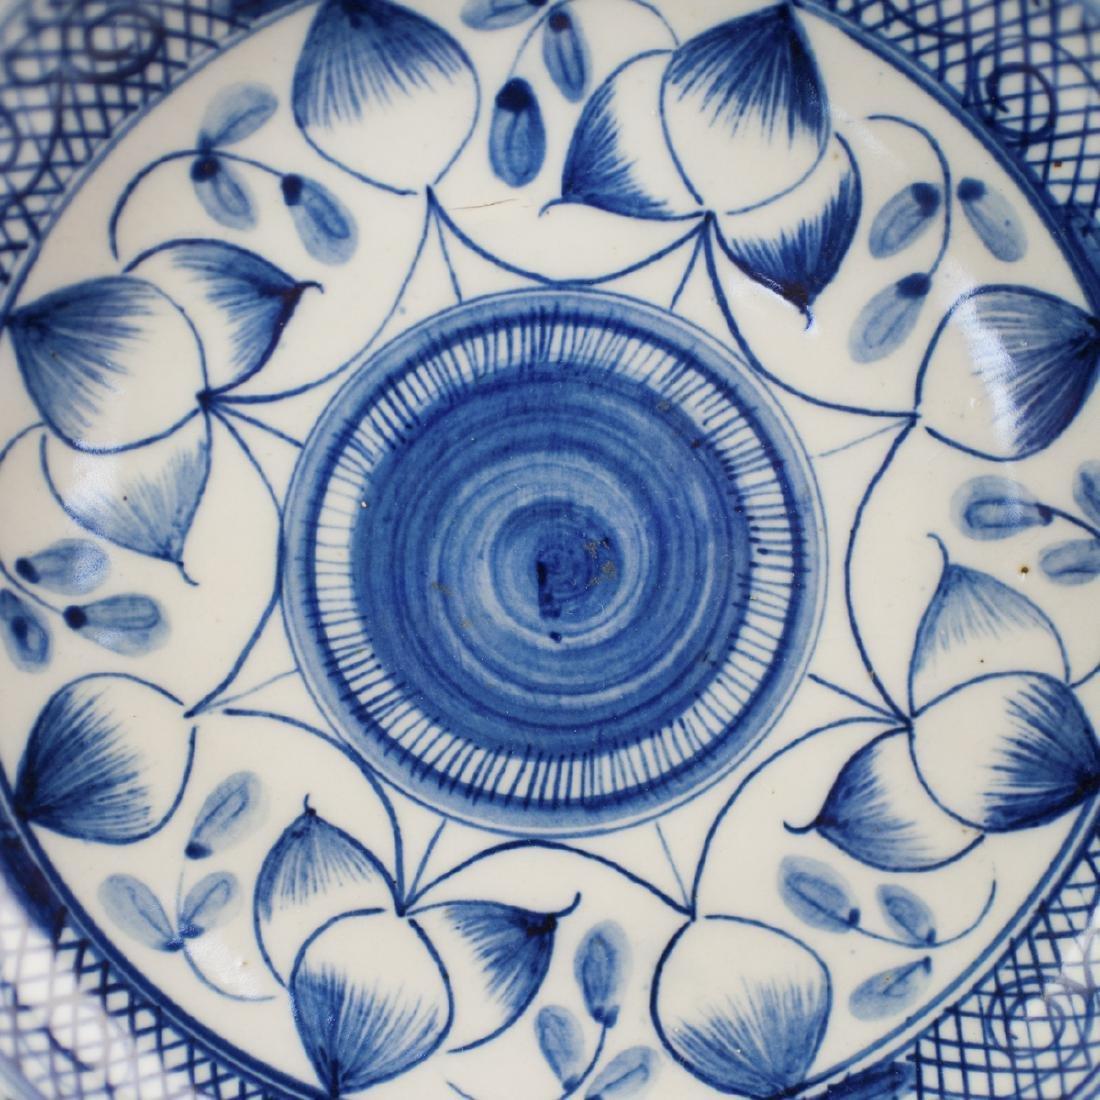 Antique Chinese Blue & White Porcelain Stem Bowl - 3